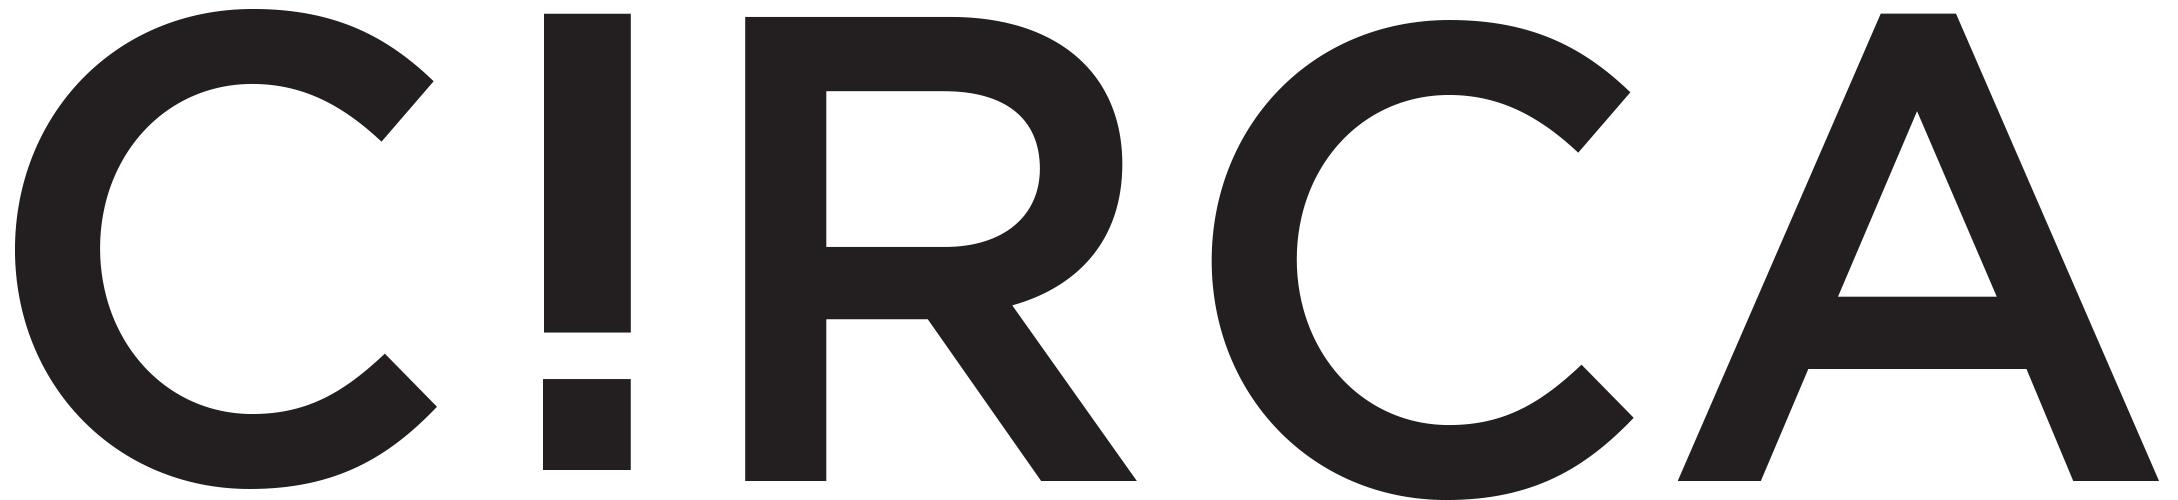 Sponsor one logo